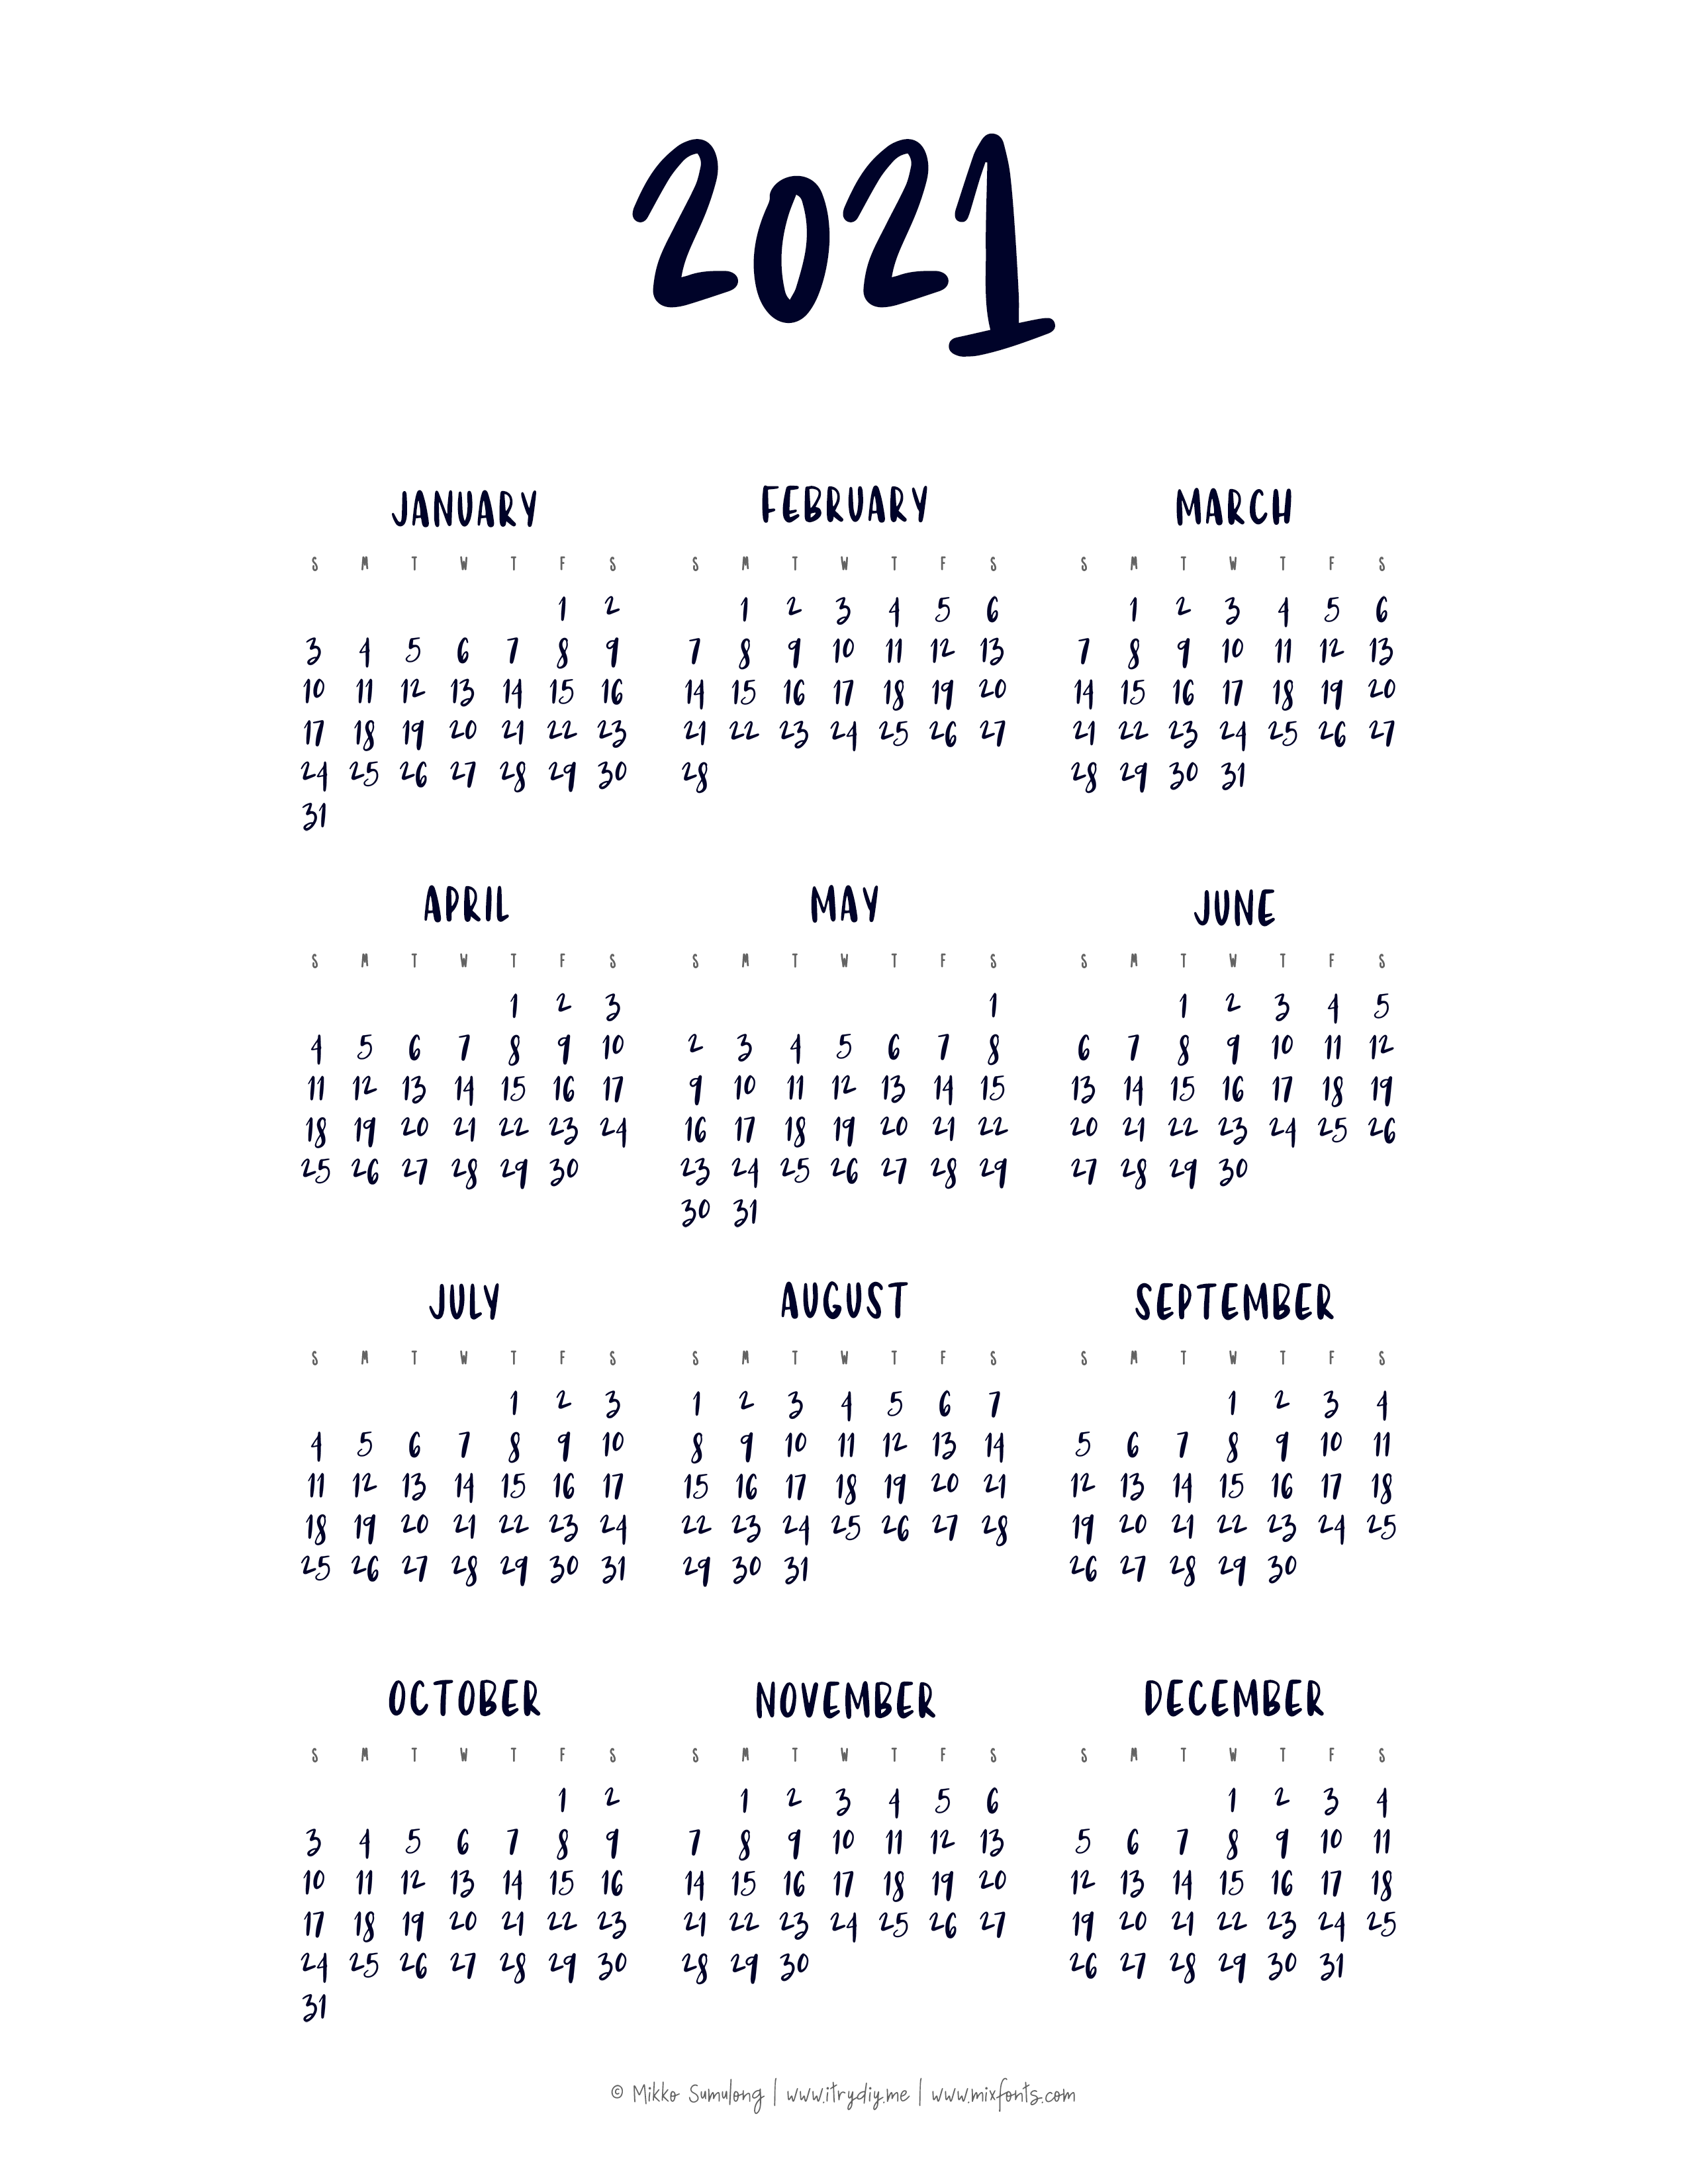 Mikko Sumulong | Are we ready for a 2021 Calendar?